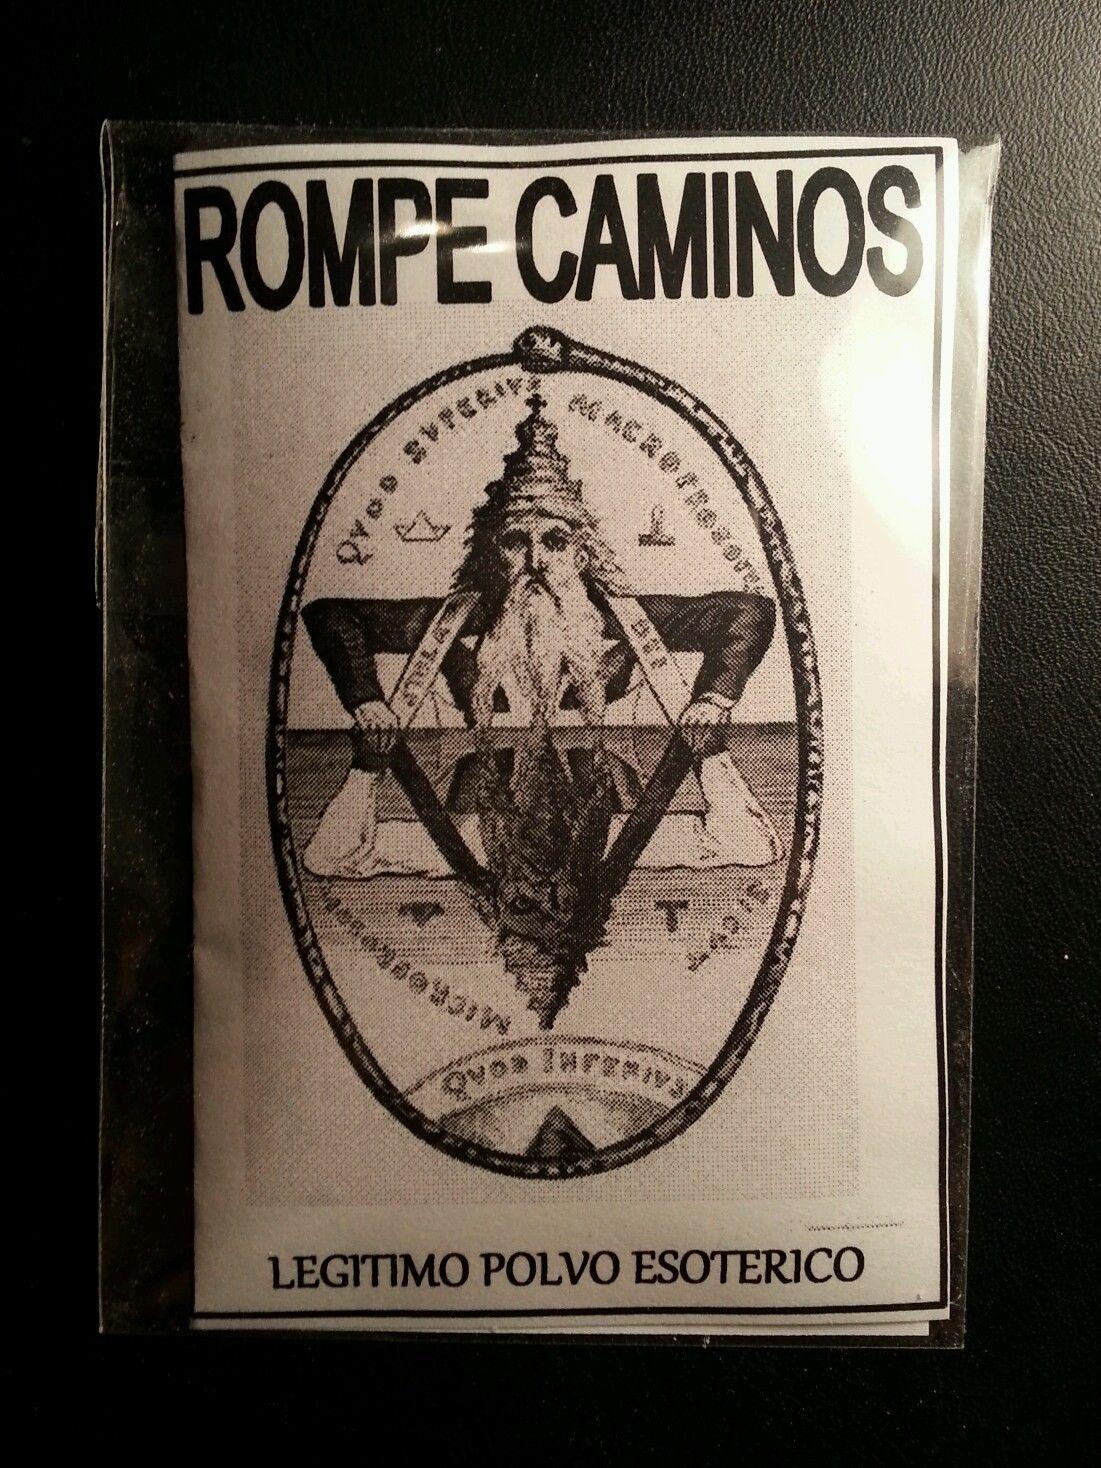 LEGITIMO POLVO ESOTERICO ROMPE CAMINOS